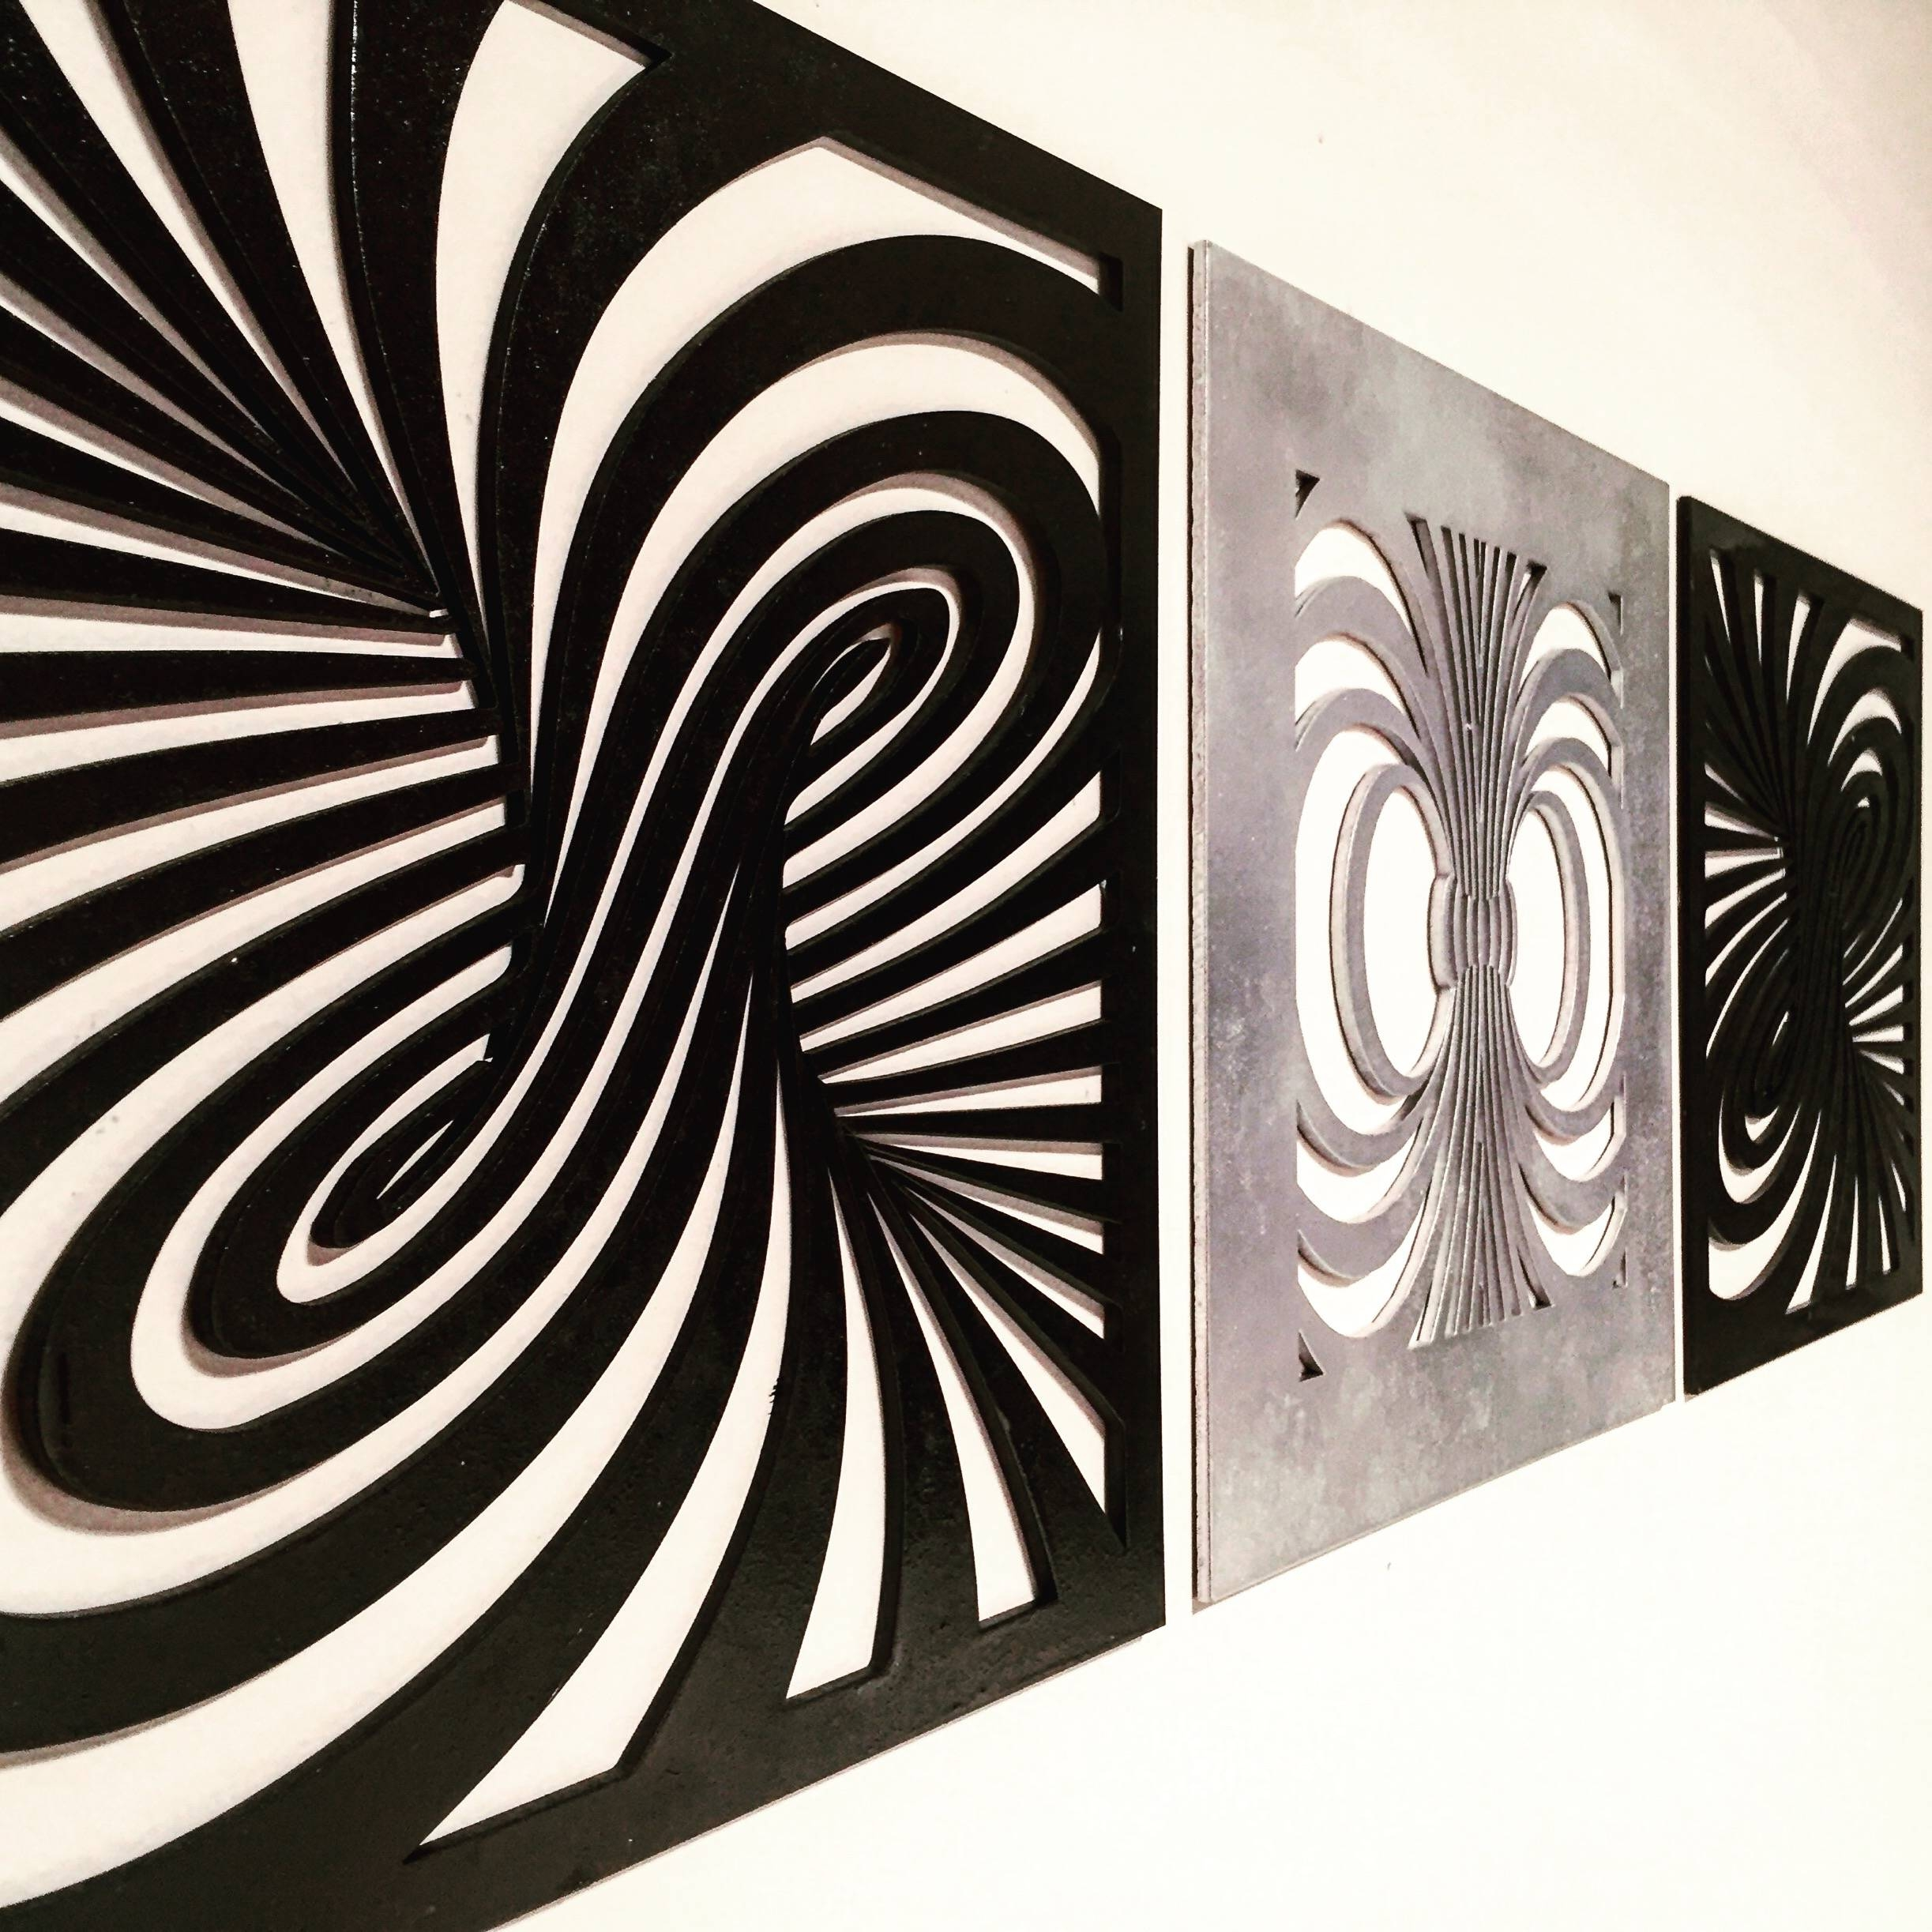 Twist Illusion Wall Art – Small Regarding 2018 Illusion Wall Art (View 14 of 20)